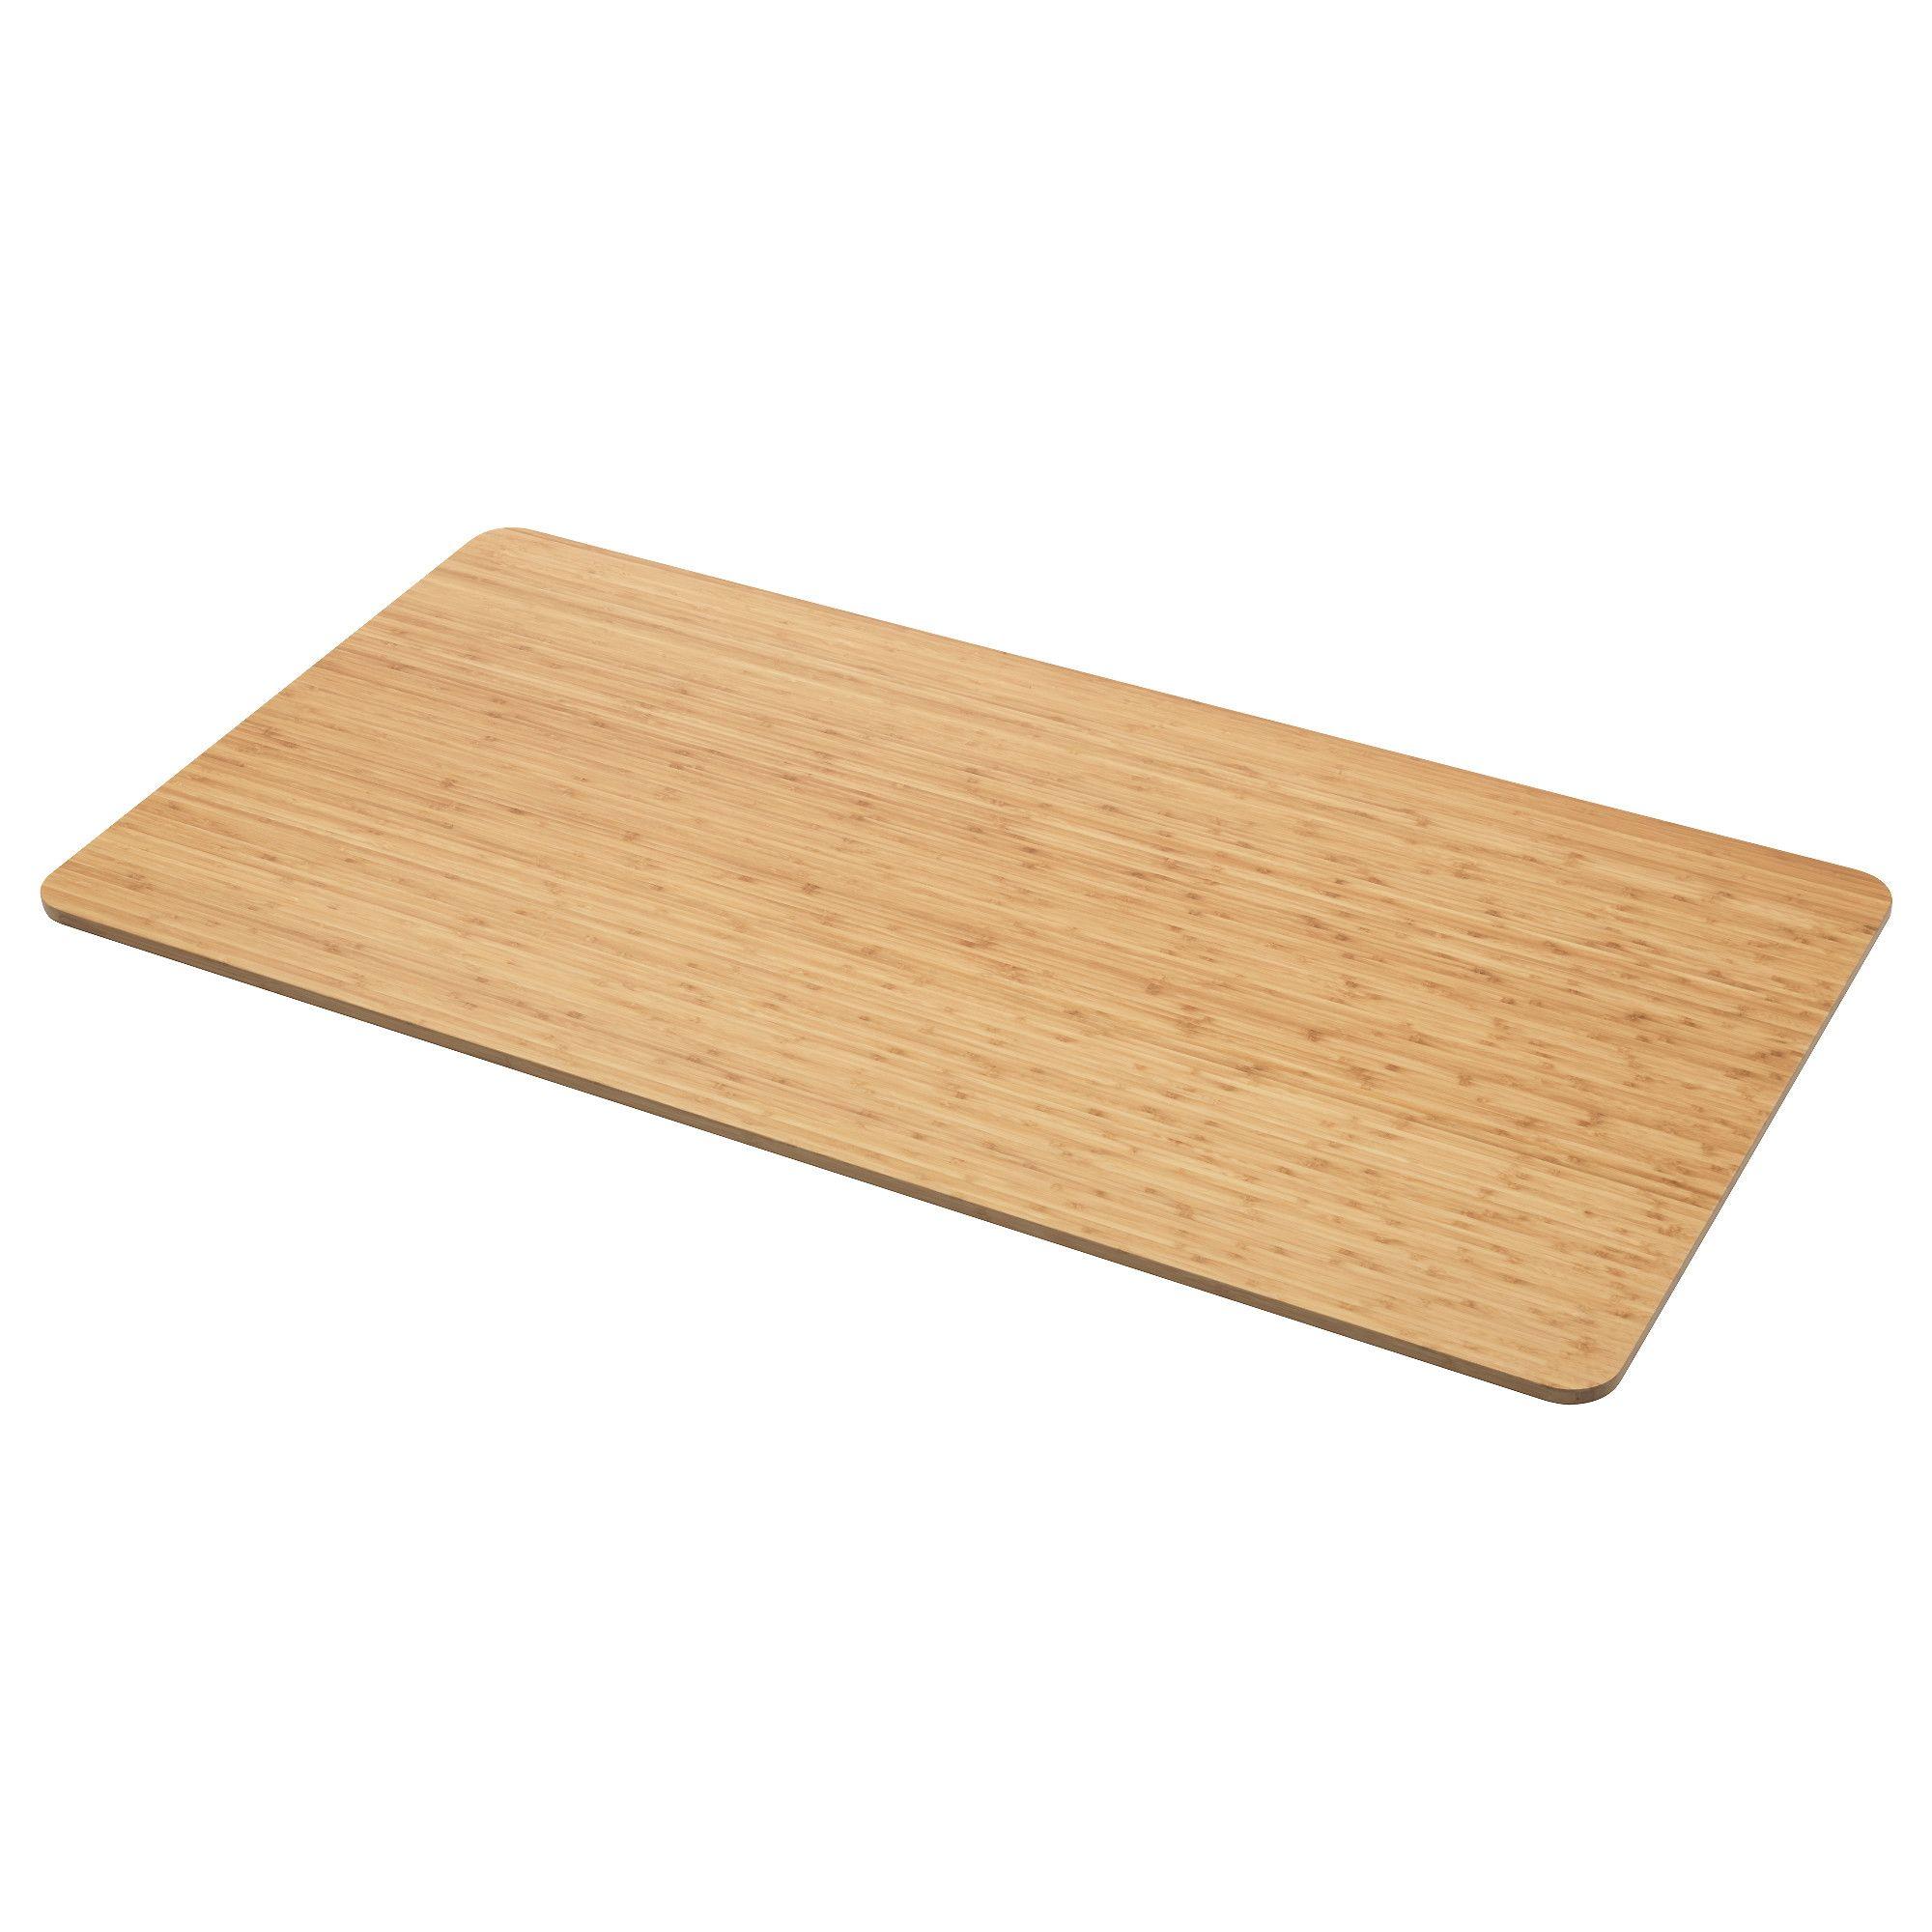 IKEA OVRARYD Bamboo Table top | Ikea hacks | Ikea table tops ...